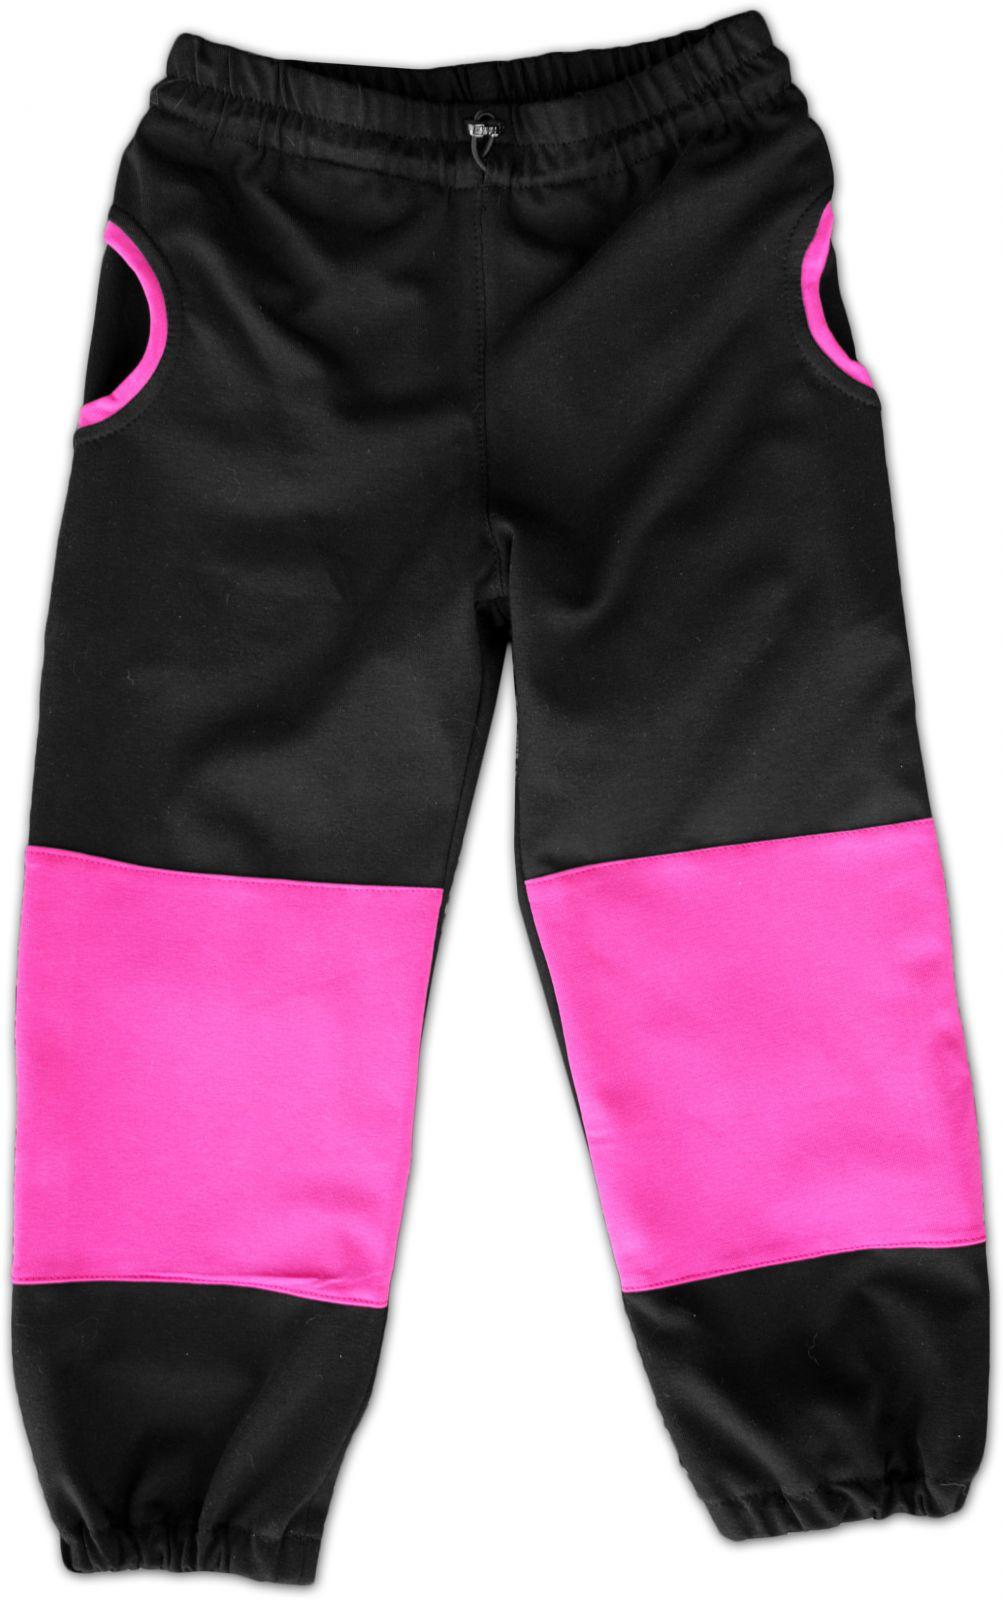 Trainingshose für Kinder, schwarz/rosa